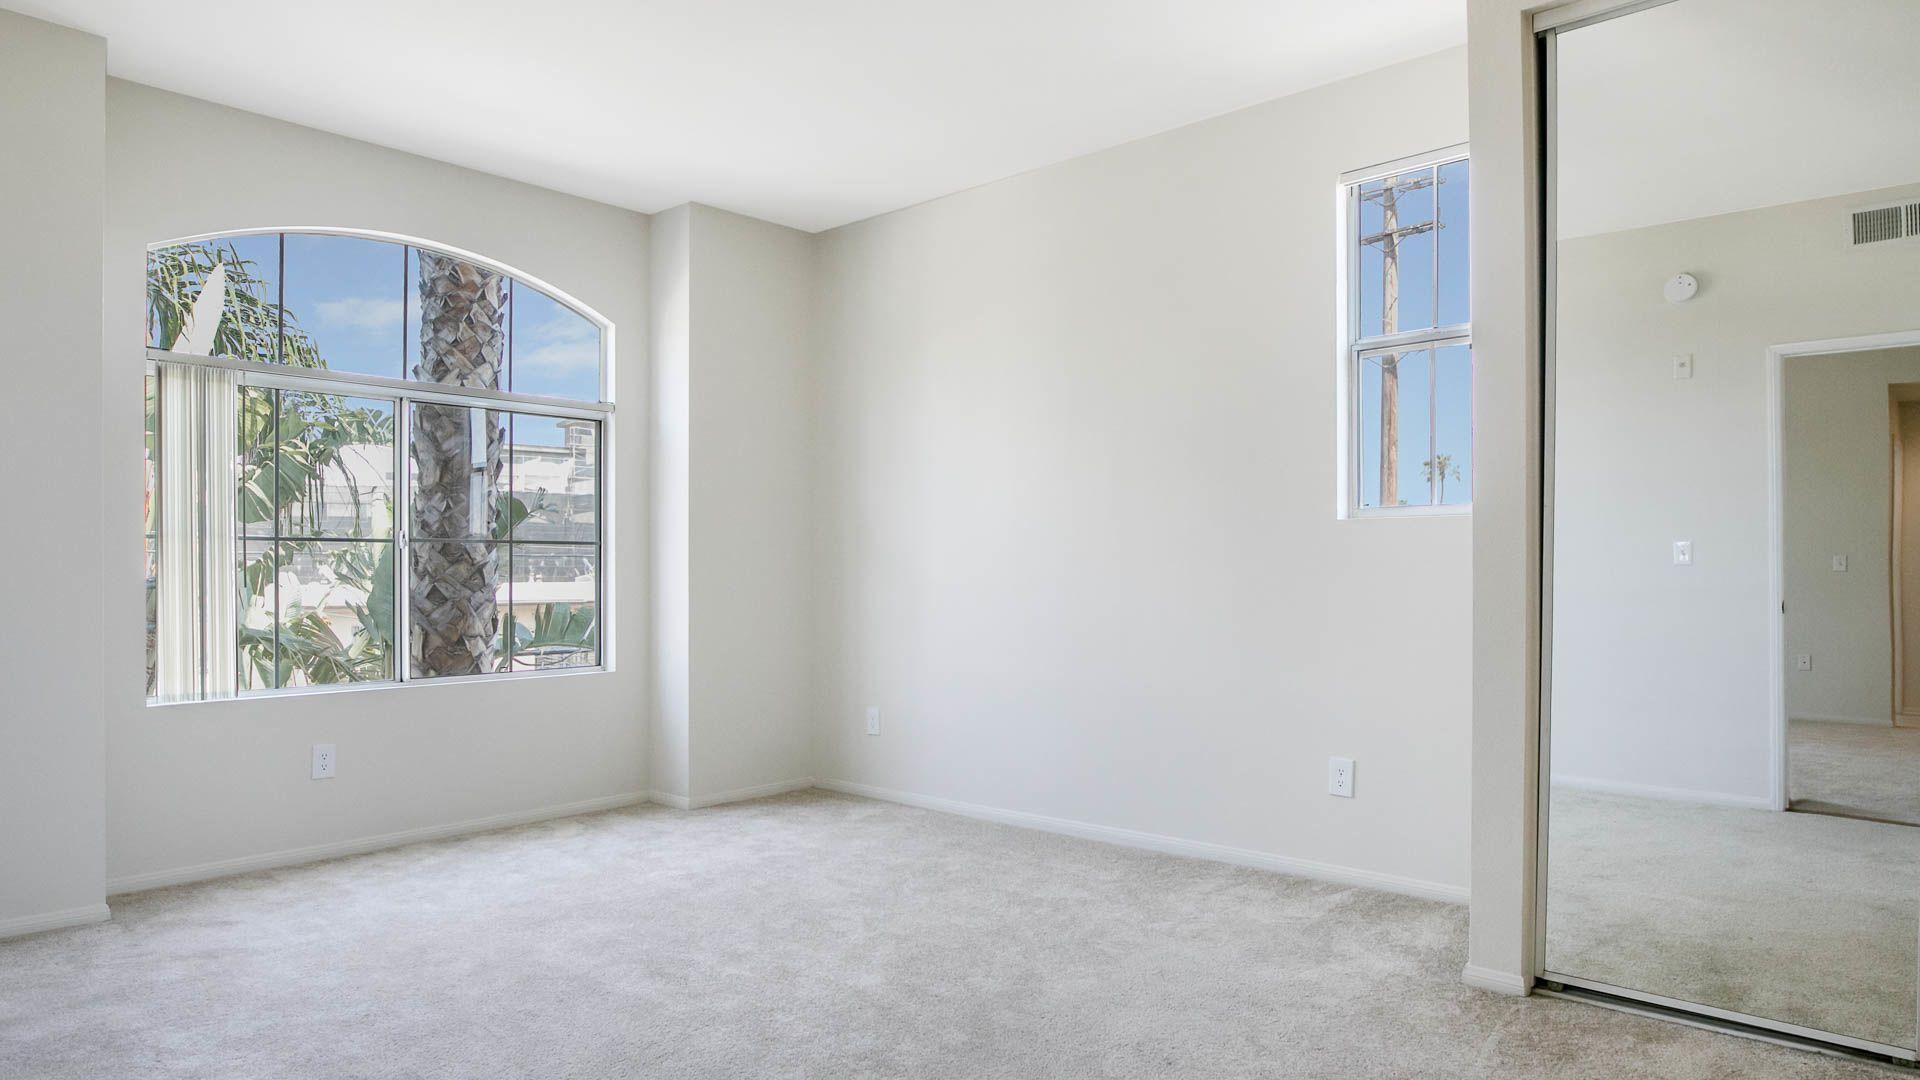 Westside on Bundy Apartments - Bedroom